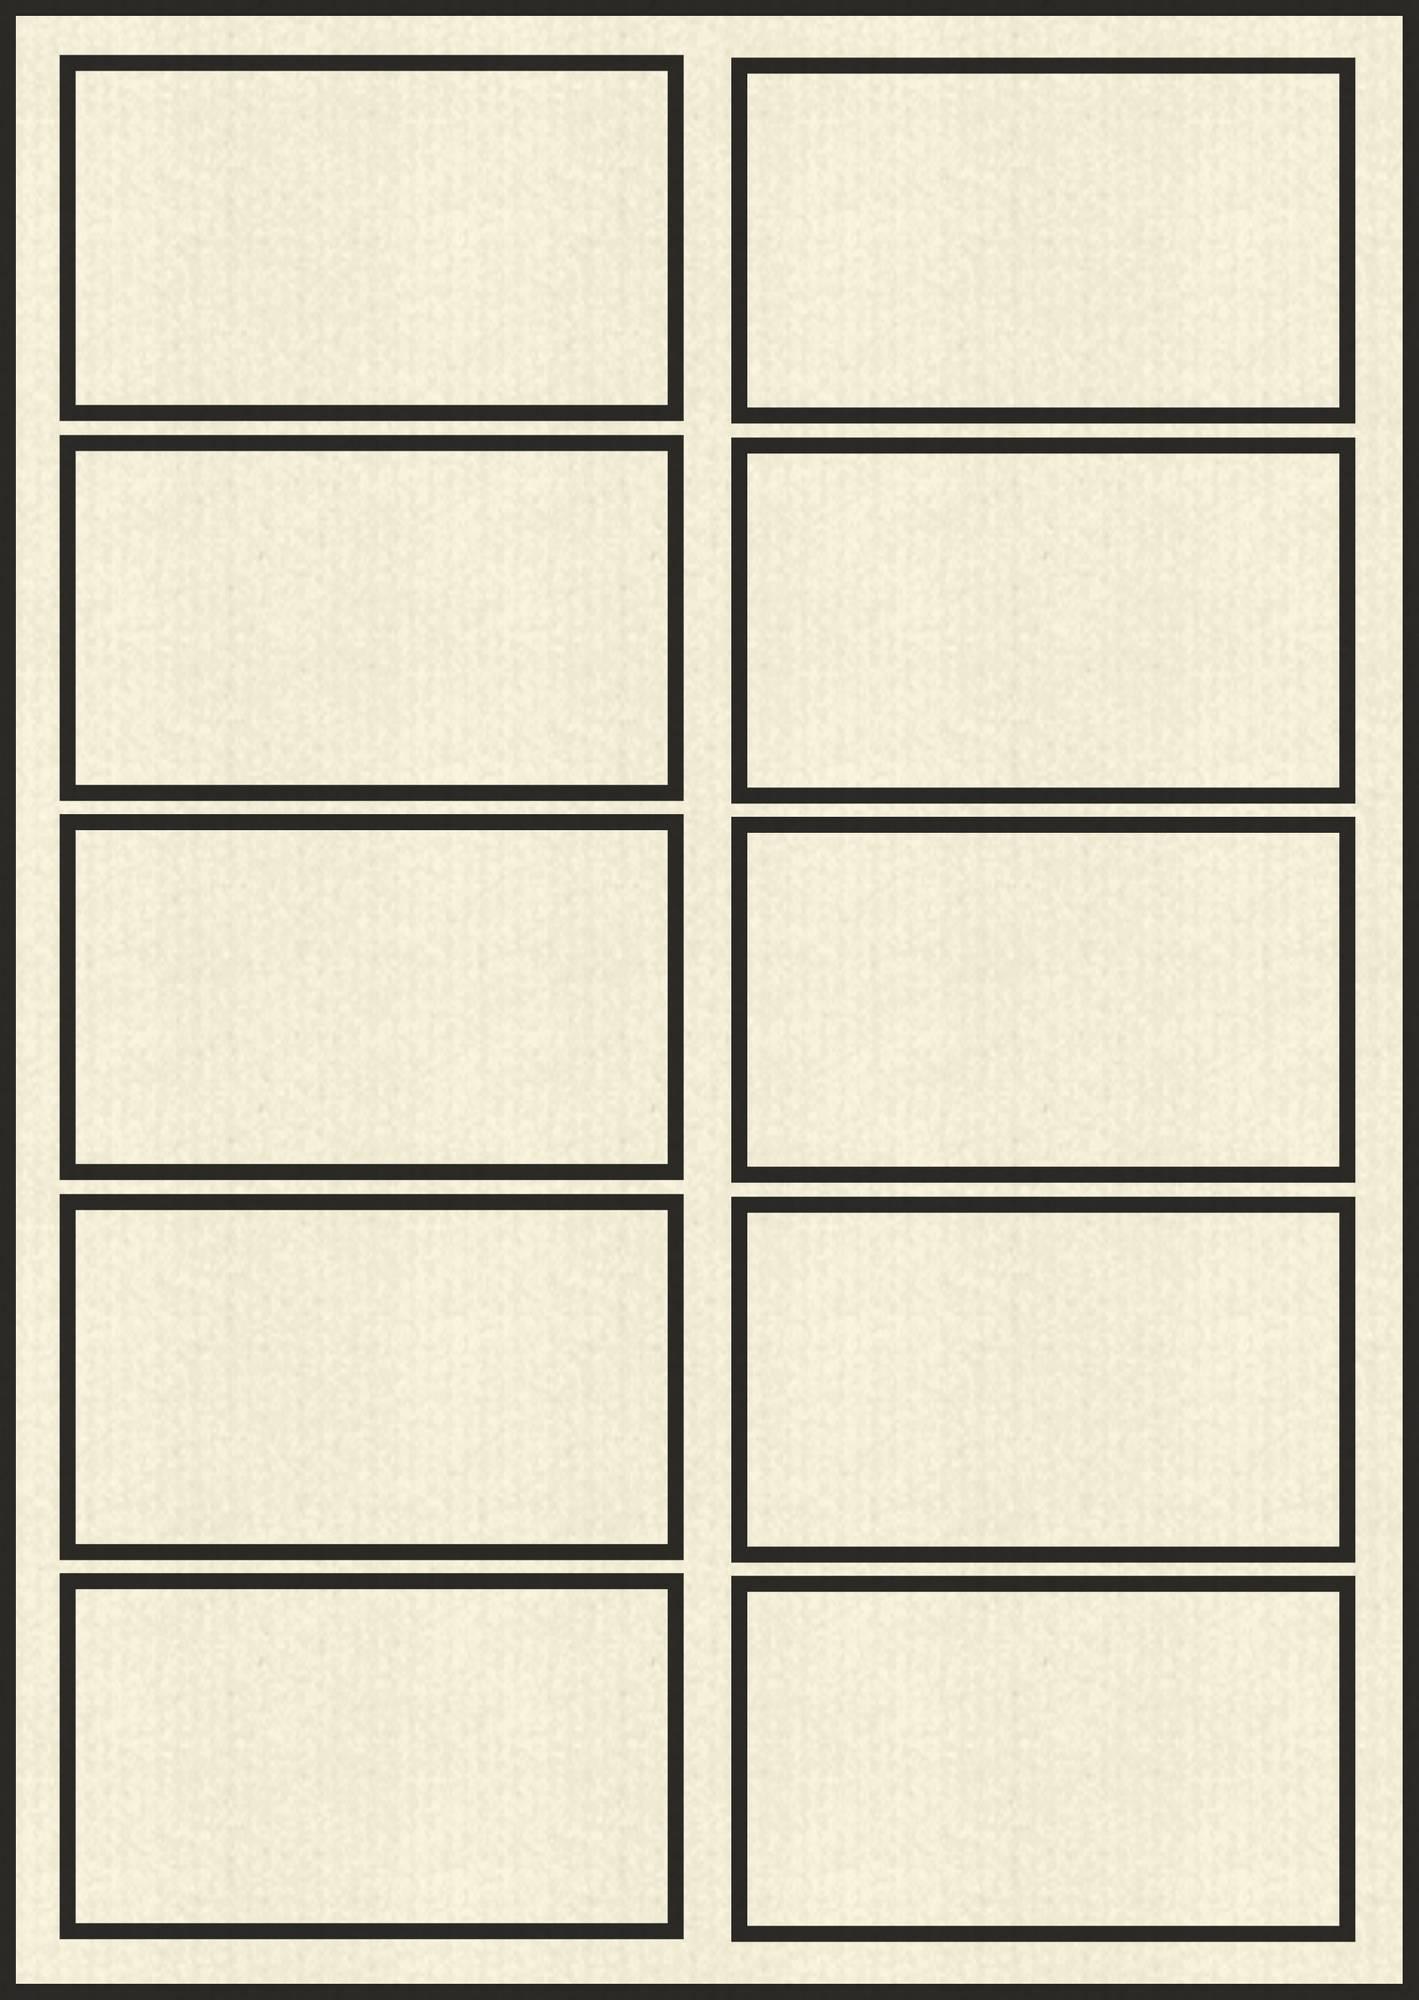 Blanko Visitenkarten 230 G Qm 86 X 54 Mm